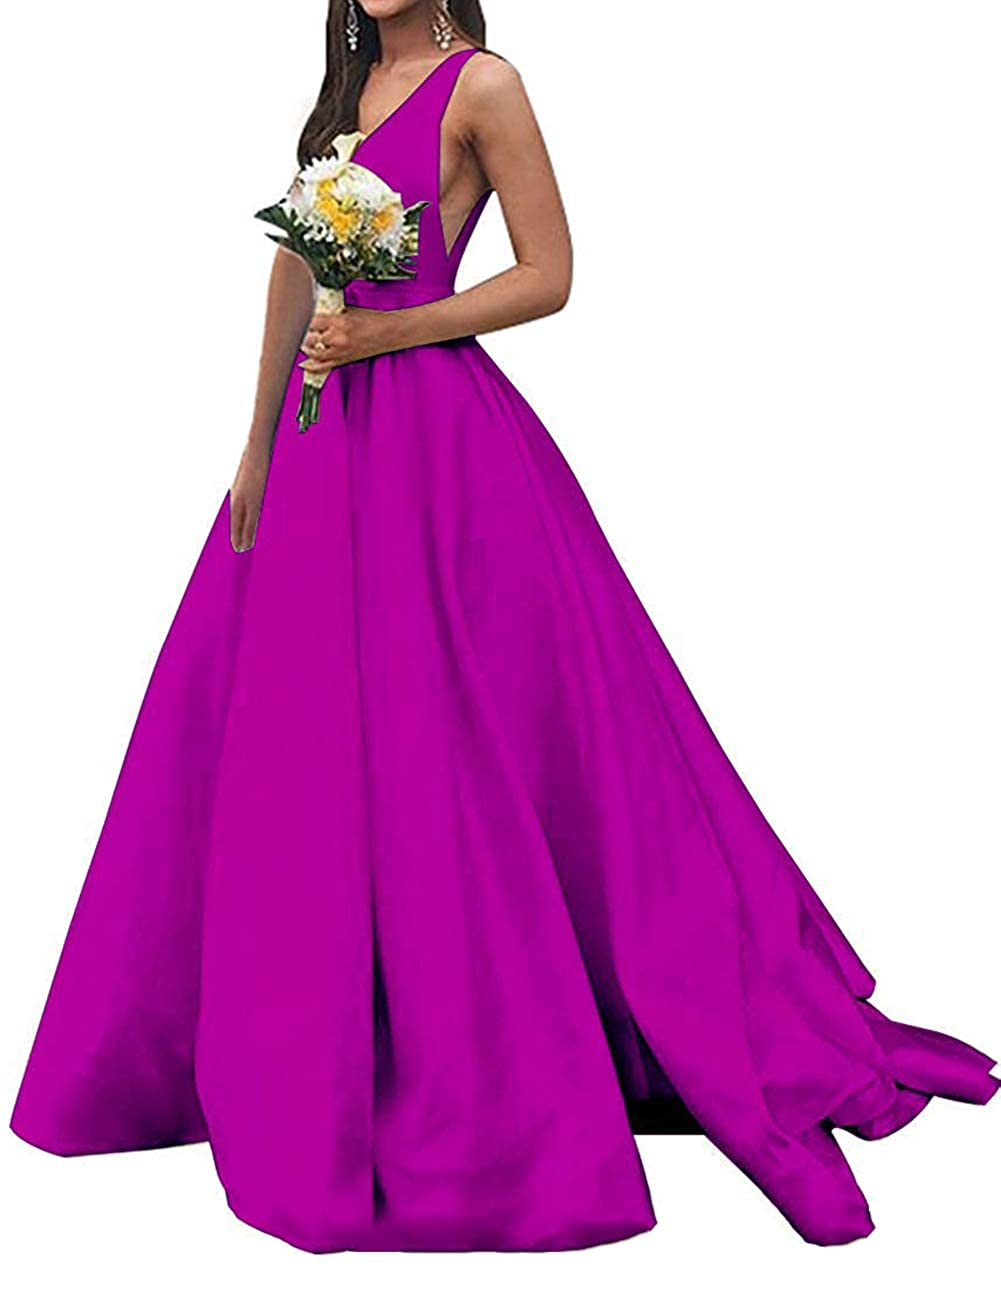 Fushcia JAEDEN Prom Dresses Formal Evening Gowns Long Evening Dresses V Neck Satin Prom Gowns Sleeveless